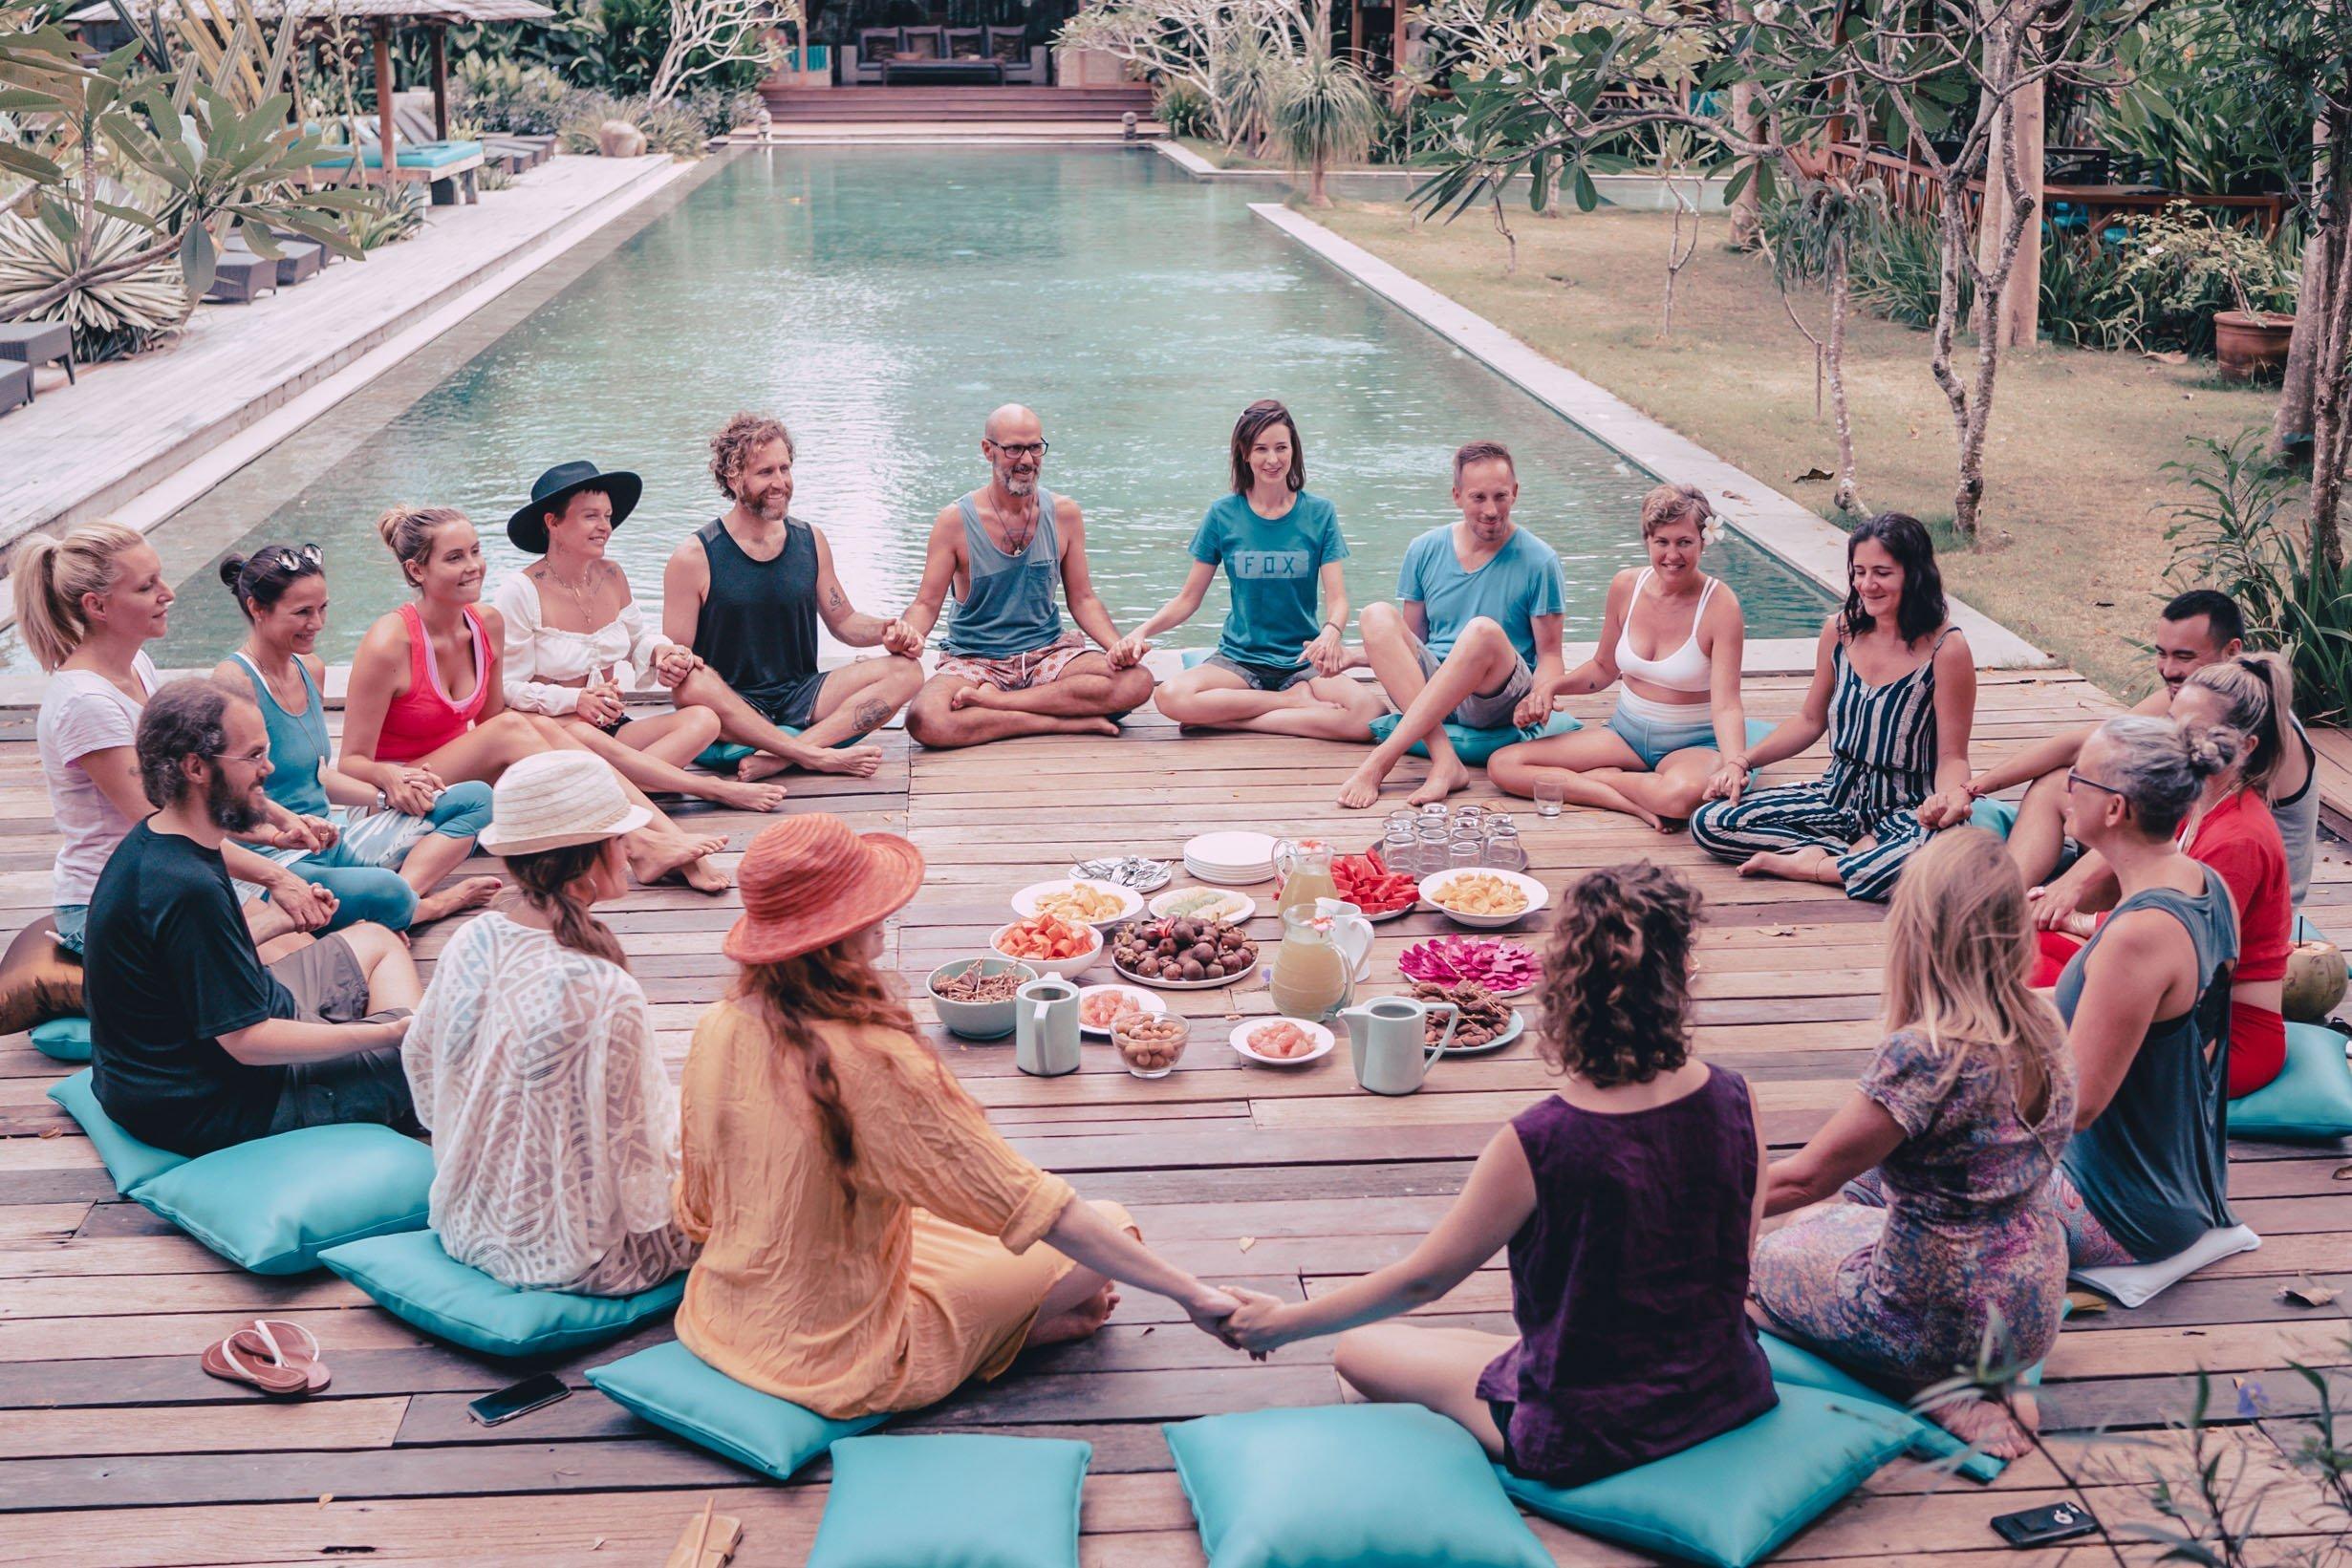 jodie-louise-photoshoots-films-videos-retreats-wrkshops-spiritual-yoga-39